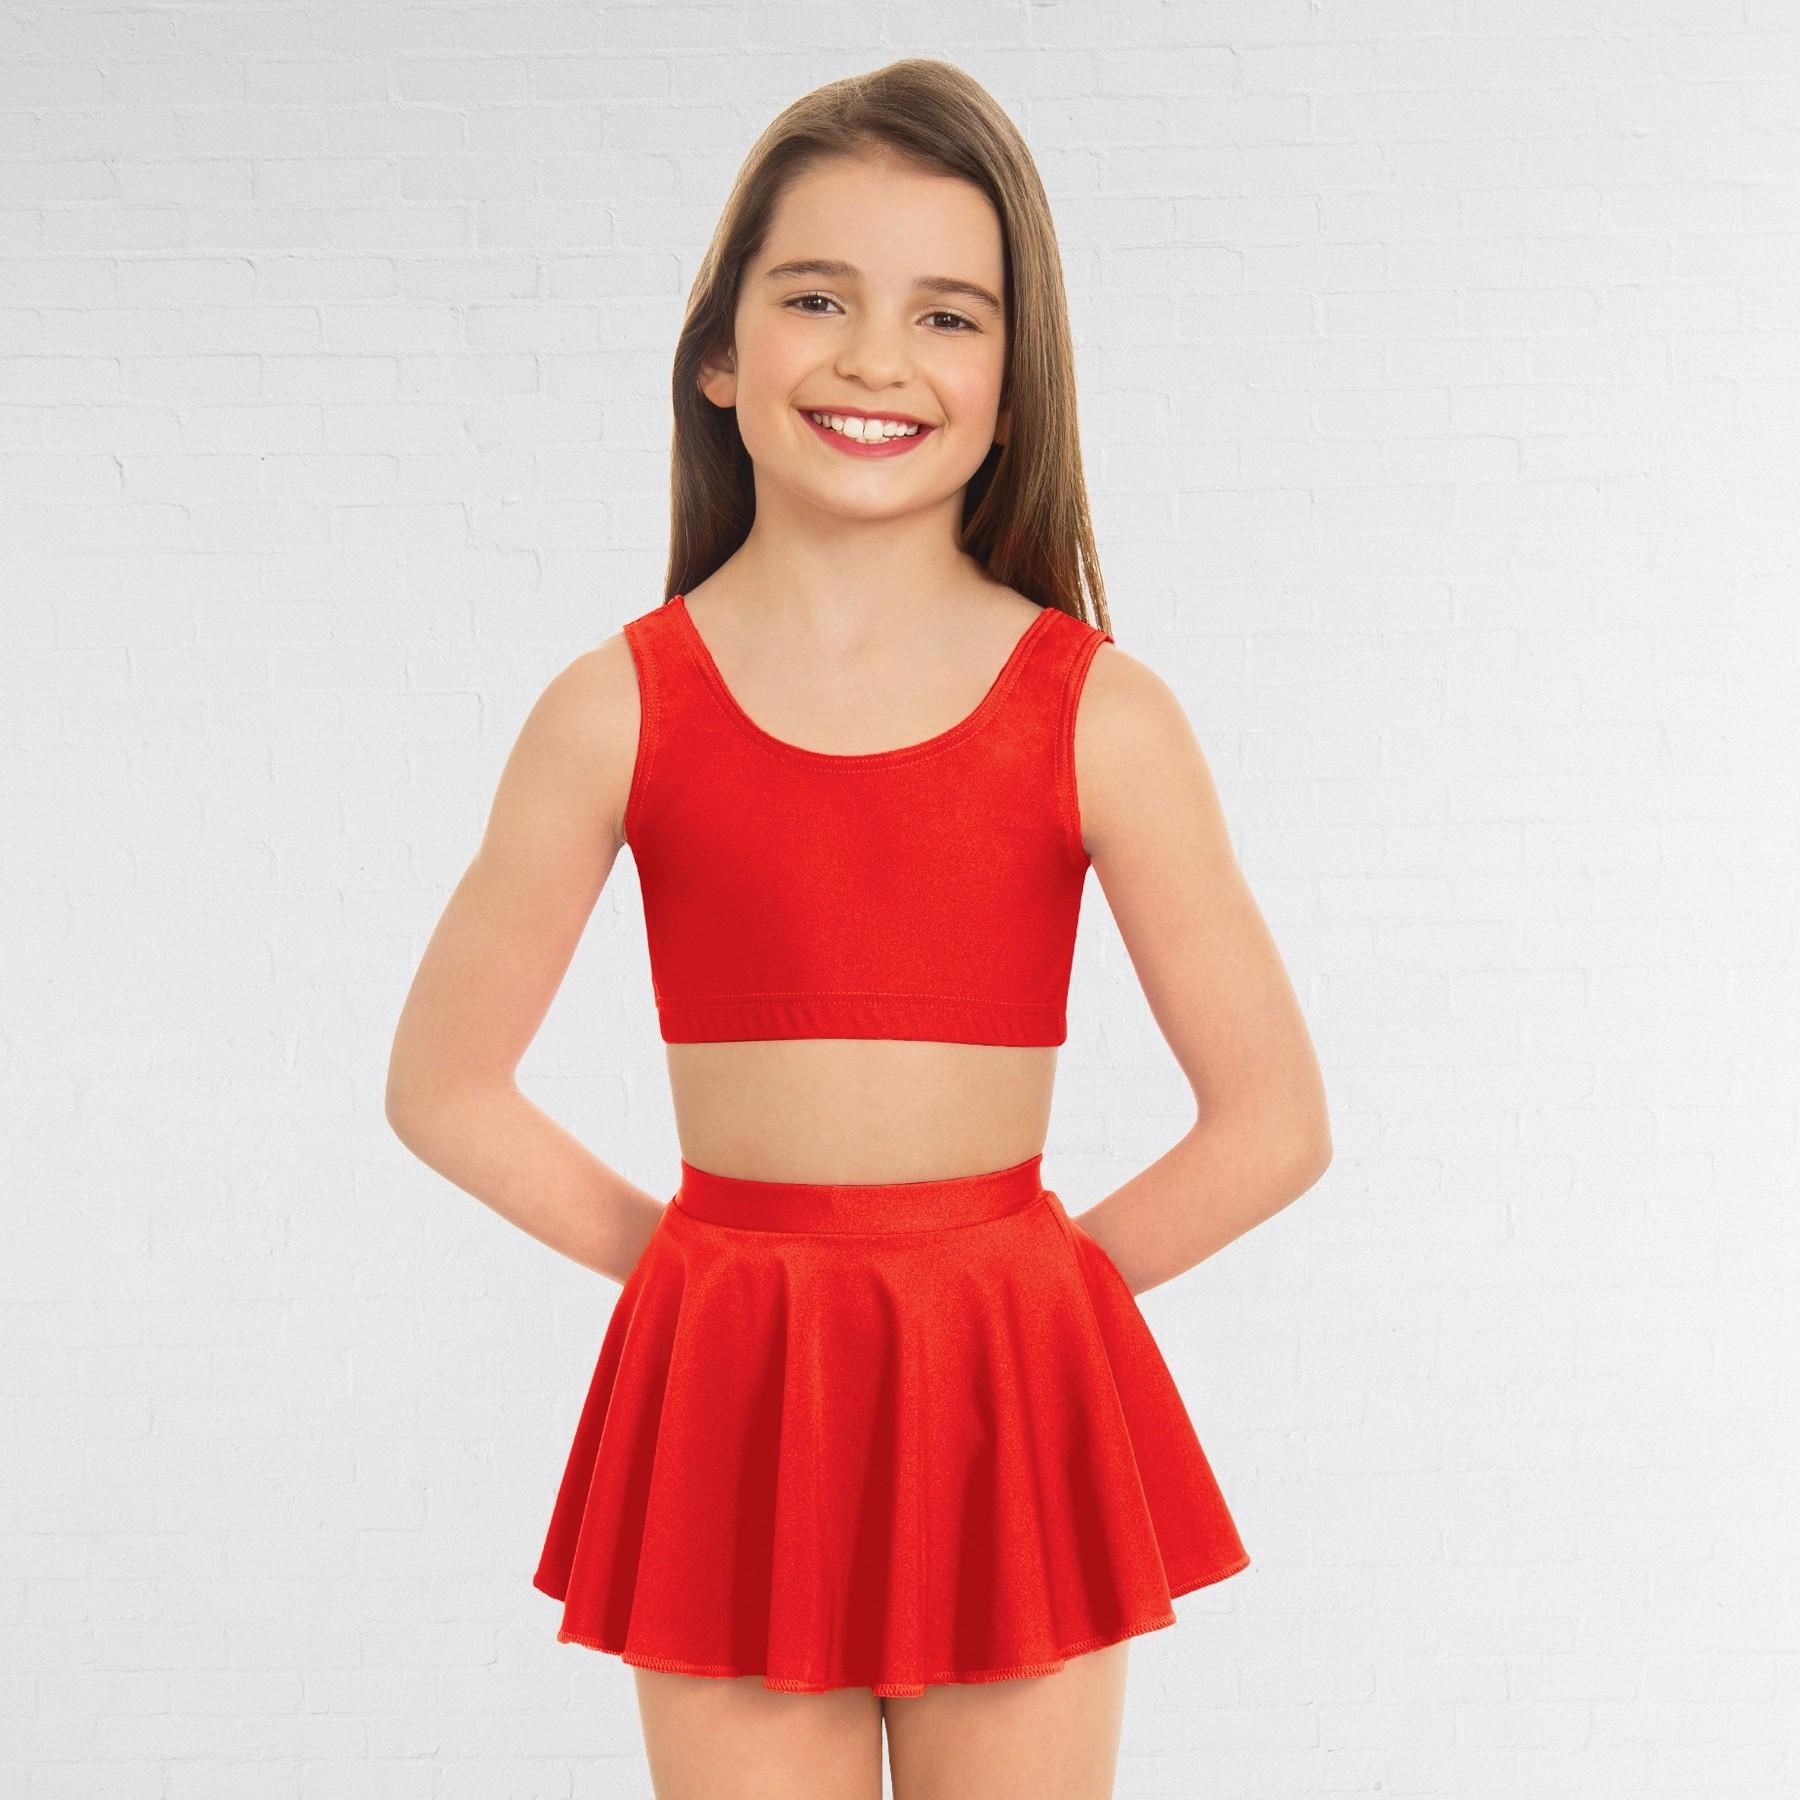 1st Position Circular Skirt (Red)